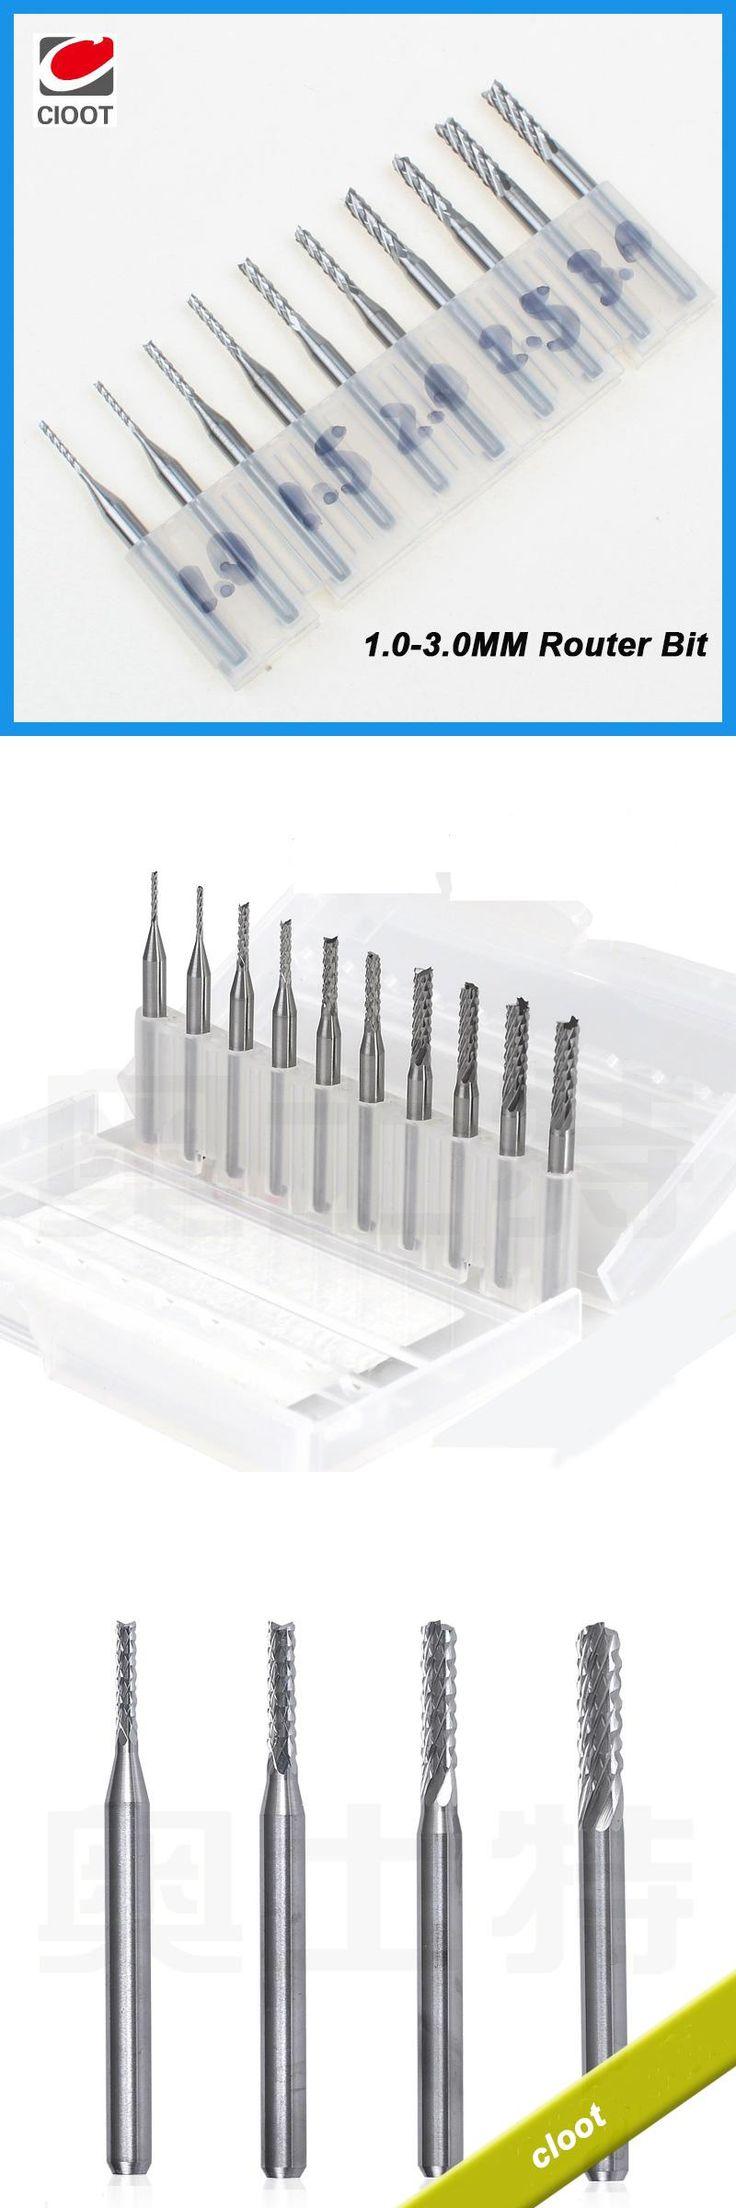 [Visit to Buy] 2017 Hot Sale CNC Router Bit Mini Pcb Carbide Machine Tools End Mill 3.175 Diameter Cnc Cutting Bits Milling Cutters Kit  #Advertisement